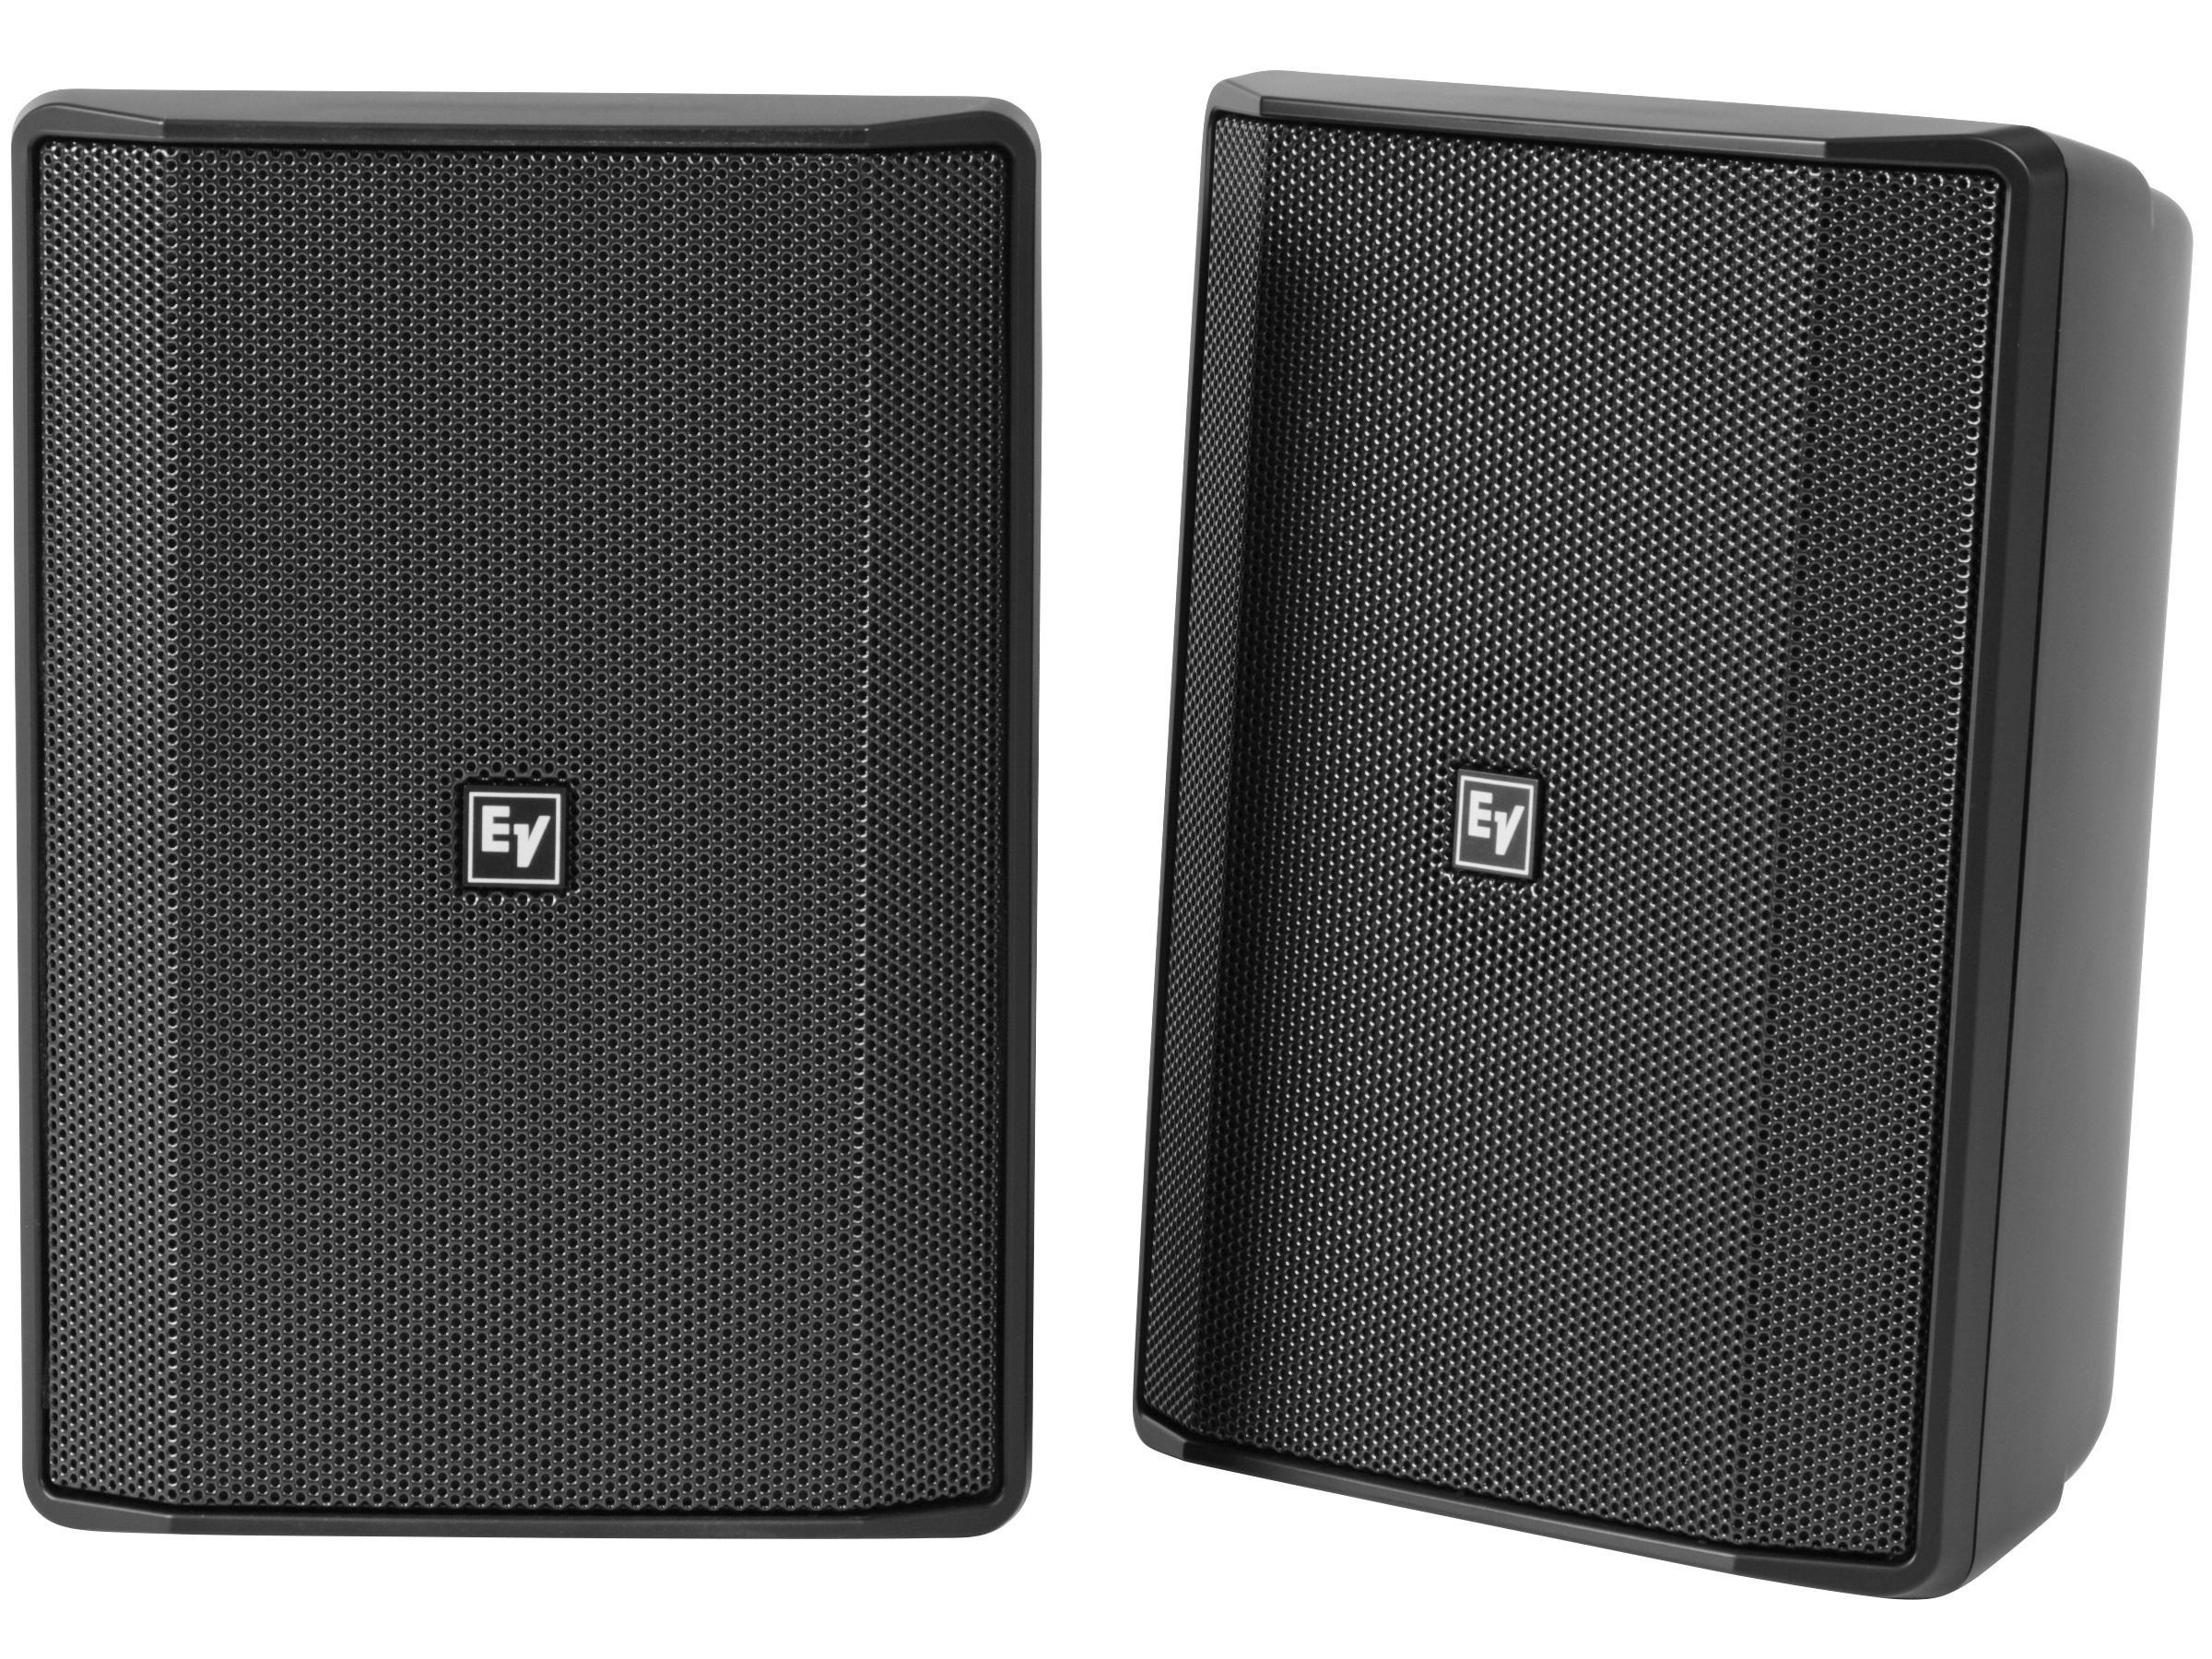 Electro-Voice EVIDS5.2XB 5 inch 70/100V IP65 Speaker Cabinet (Black/Pair)